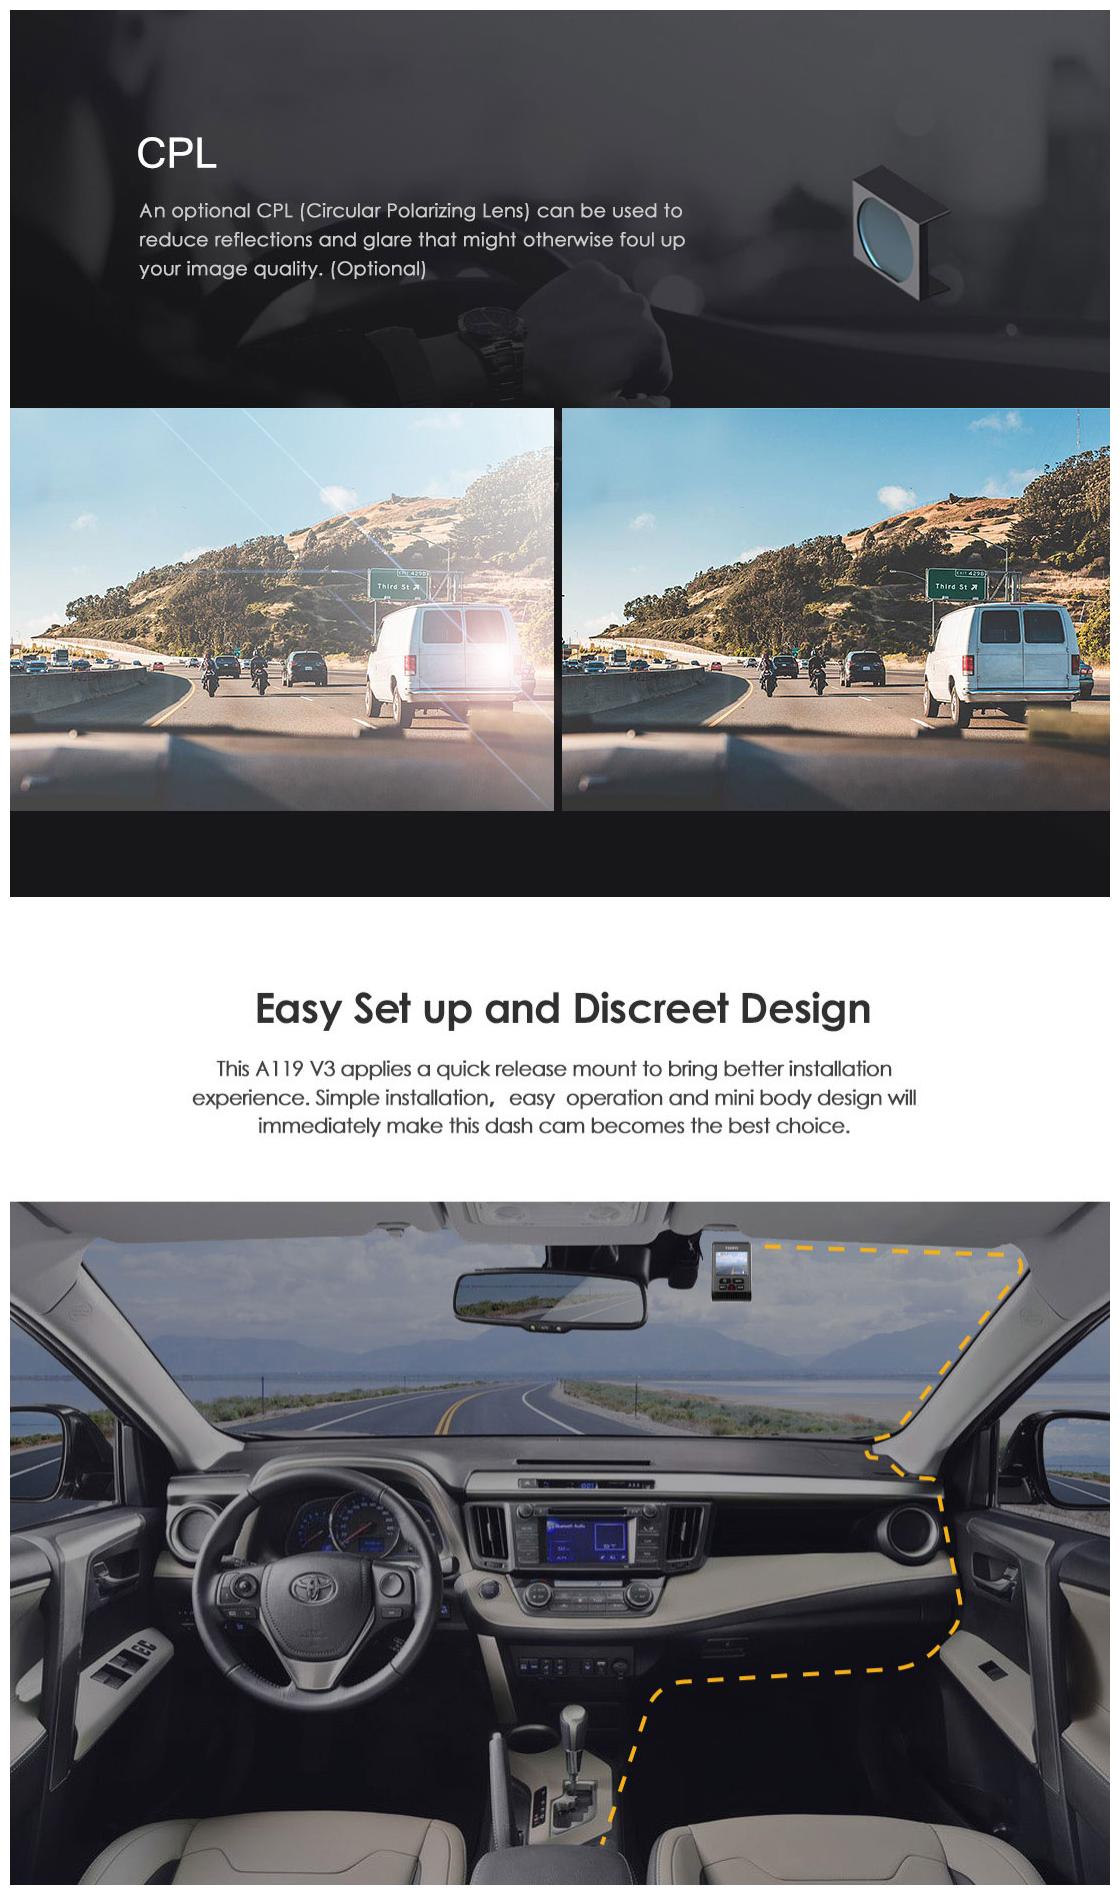 VIOFO A119 V3 2019 Latest Version 2560*1600P Car Dash Cam 140° Wide Viewing Angle DVR Camera with GPS